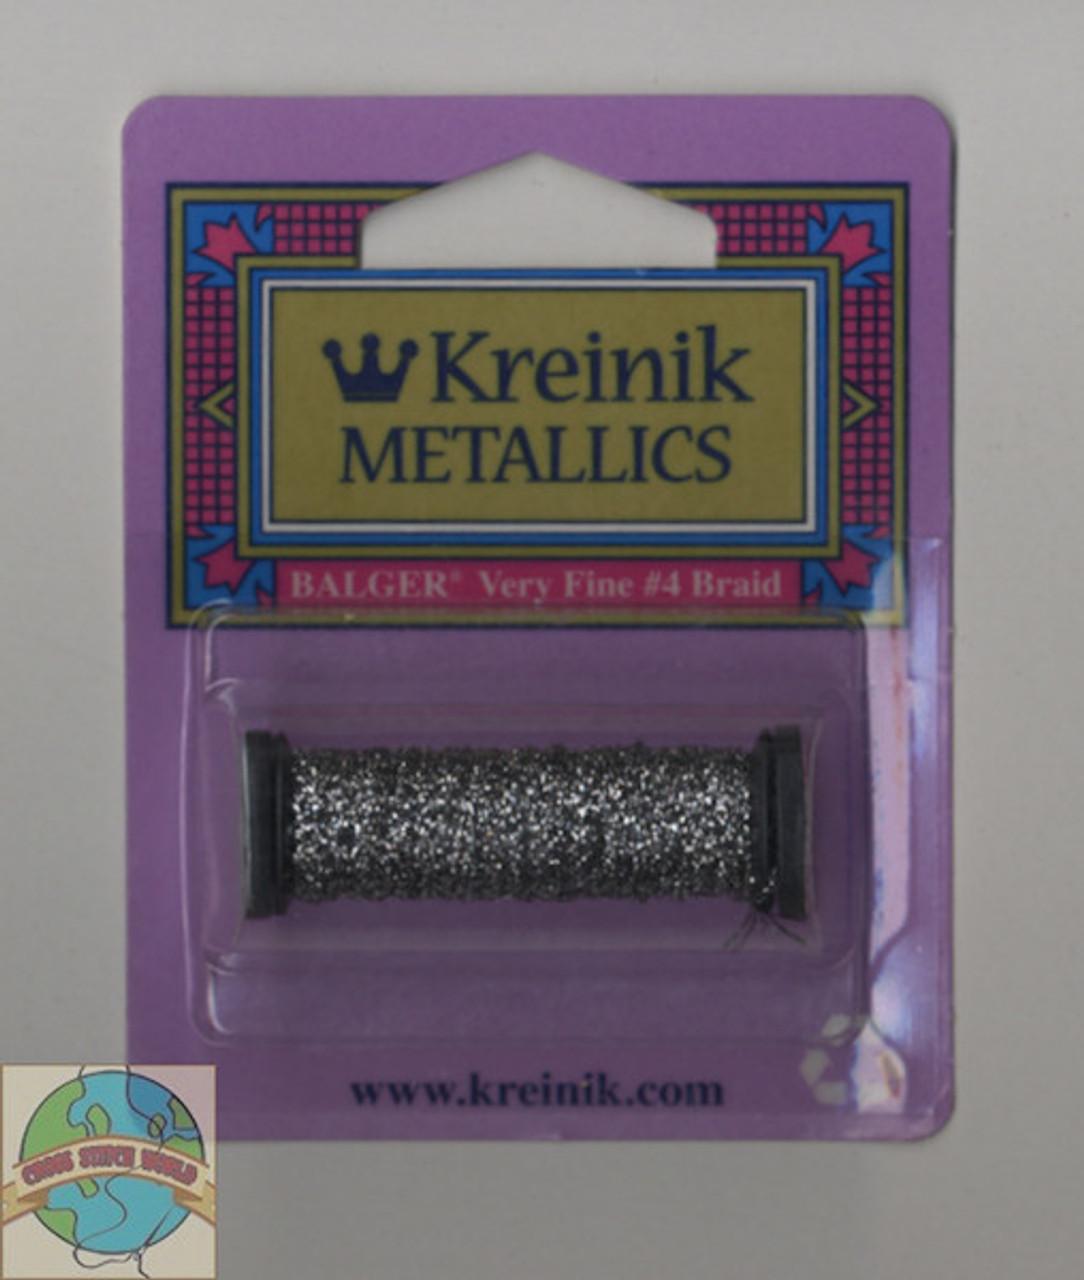 Kreinik Metallics - Very Fine #4 Pewter 019